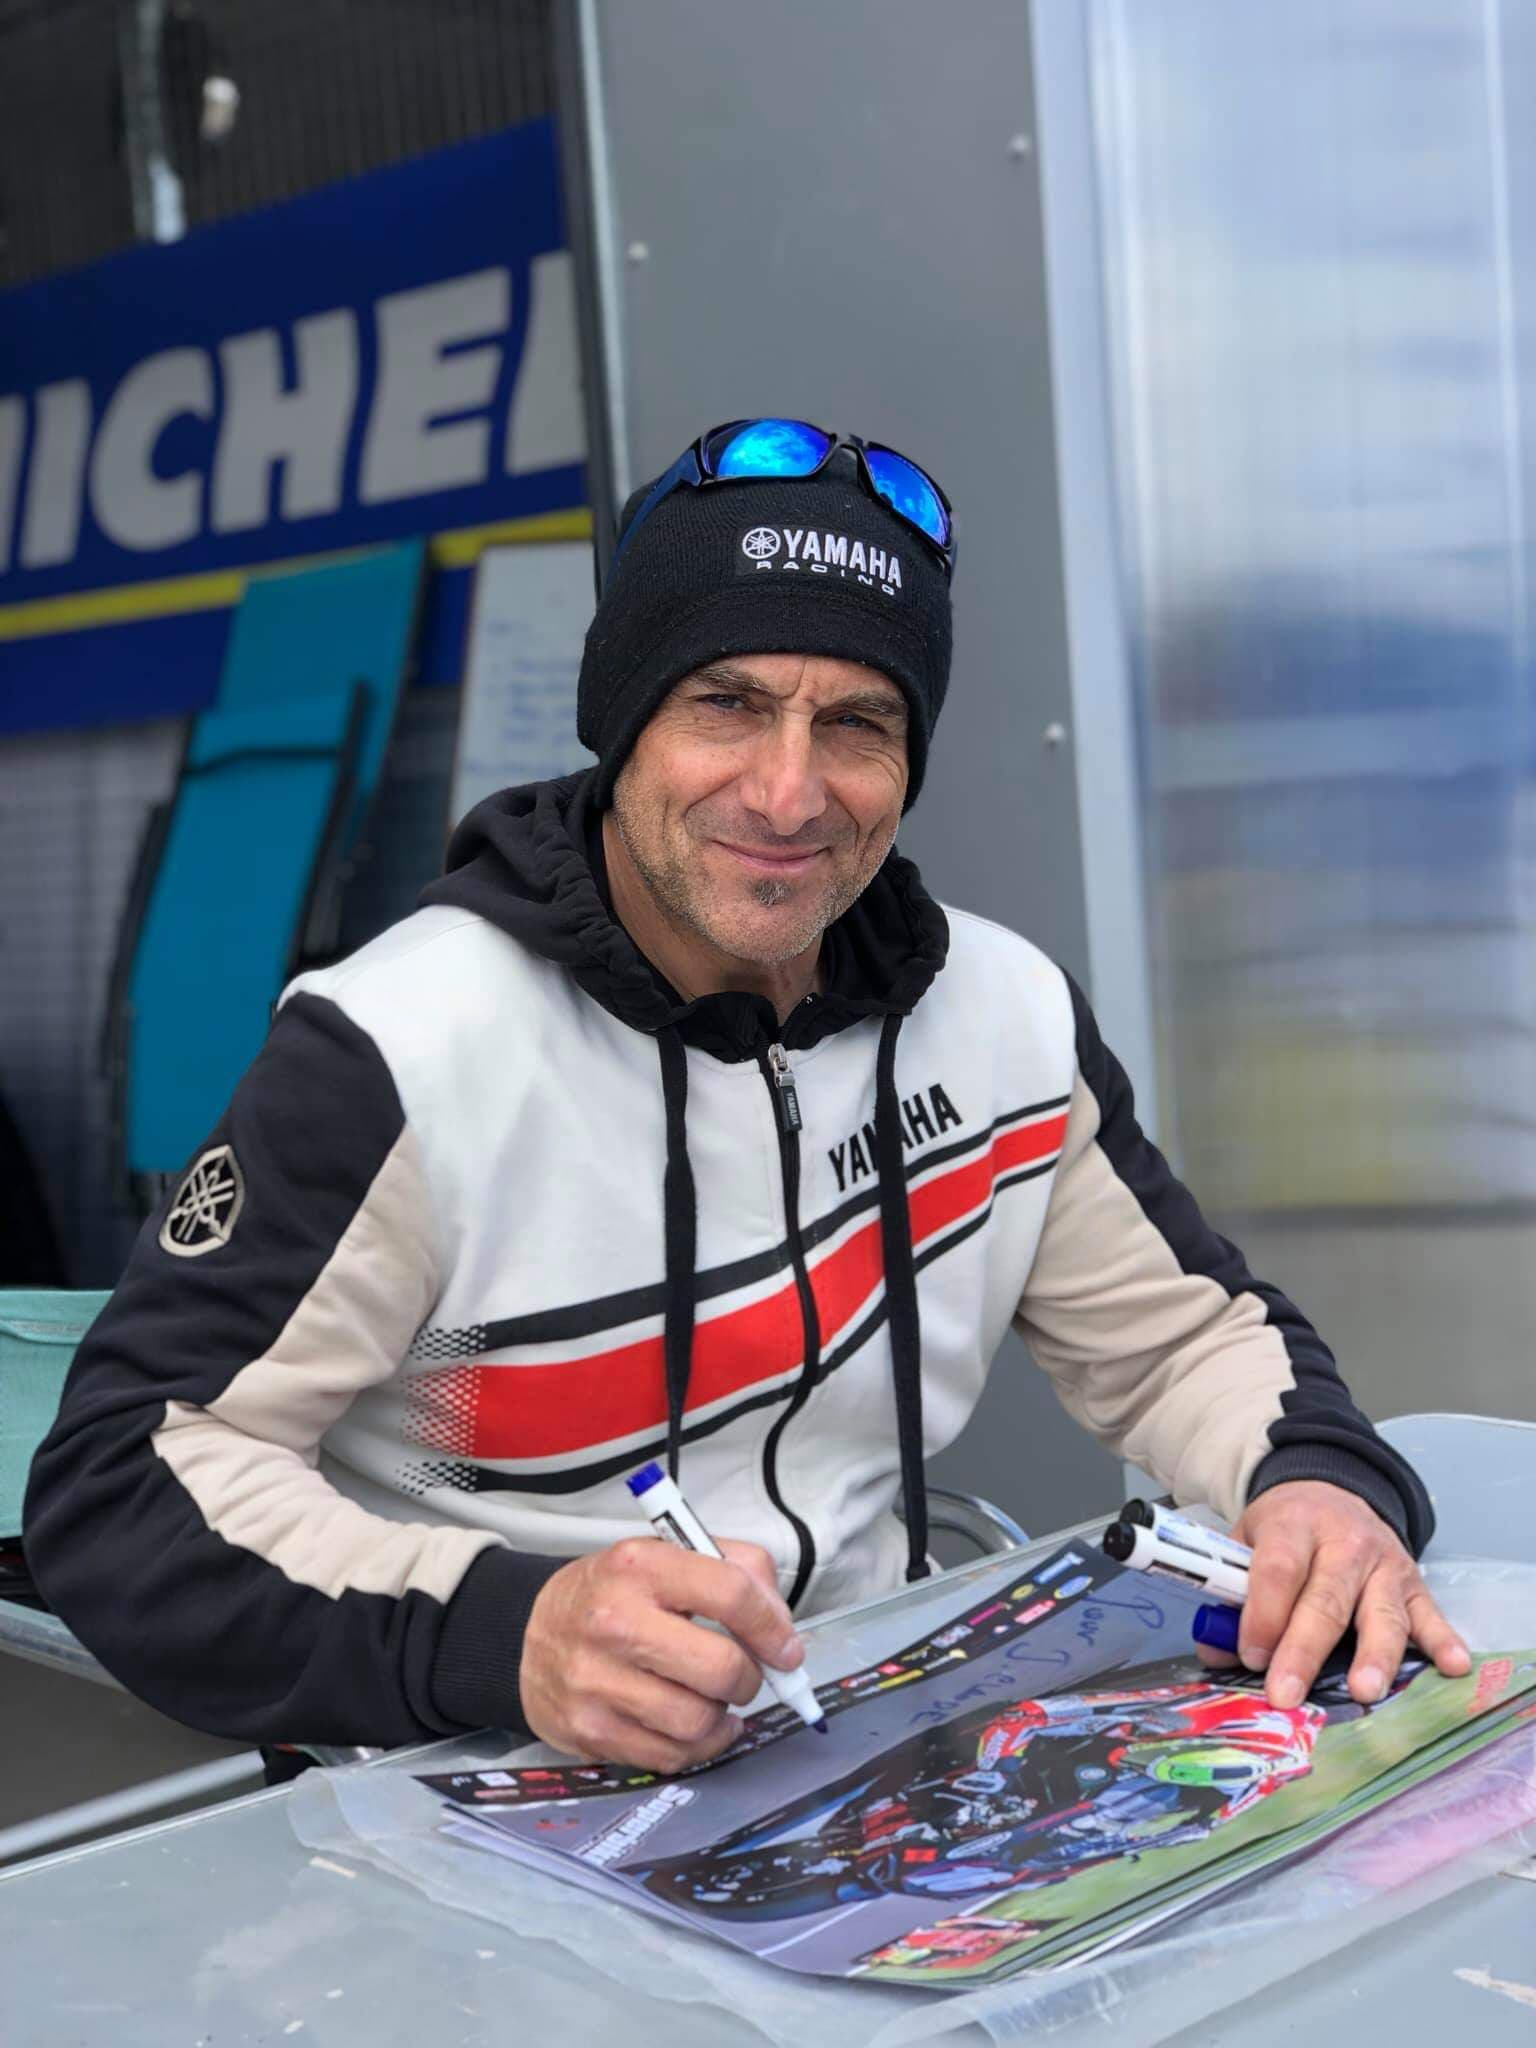 Sergio nangeroni au circuit nogaro fsbk 2019